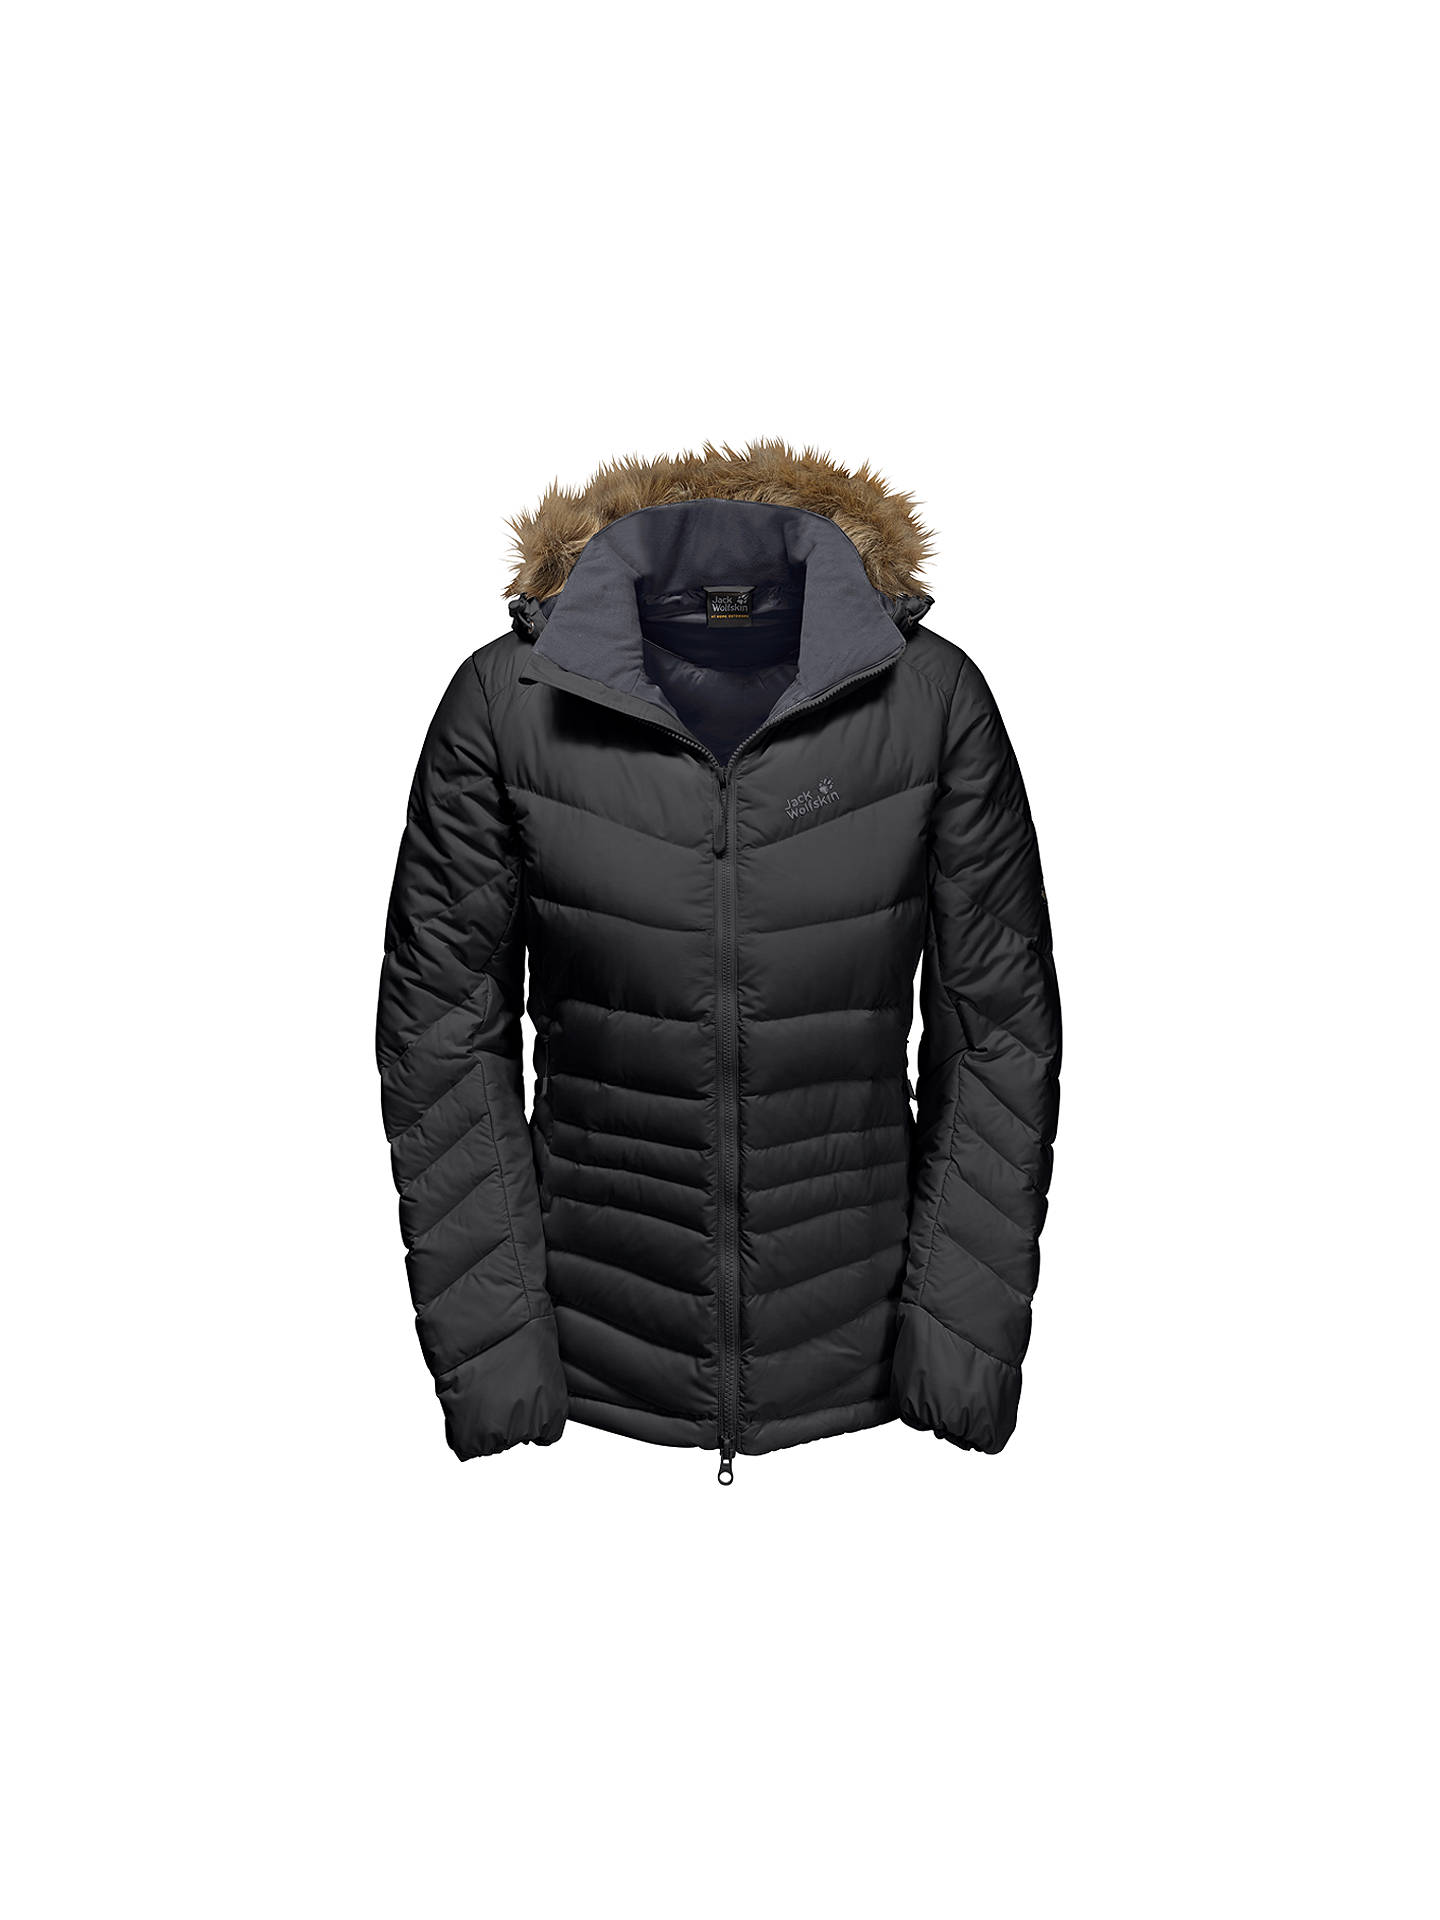 884b5ba0f16 Buy Jack Wolfskin Selenium Bay Windproof Women's Jacket, Black, XS Online  at johnlewis.